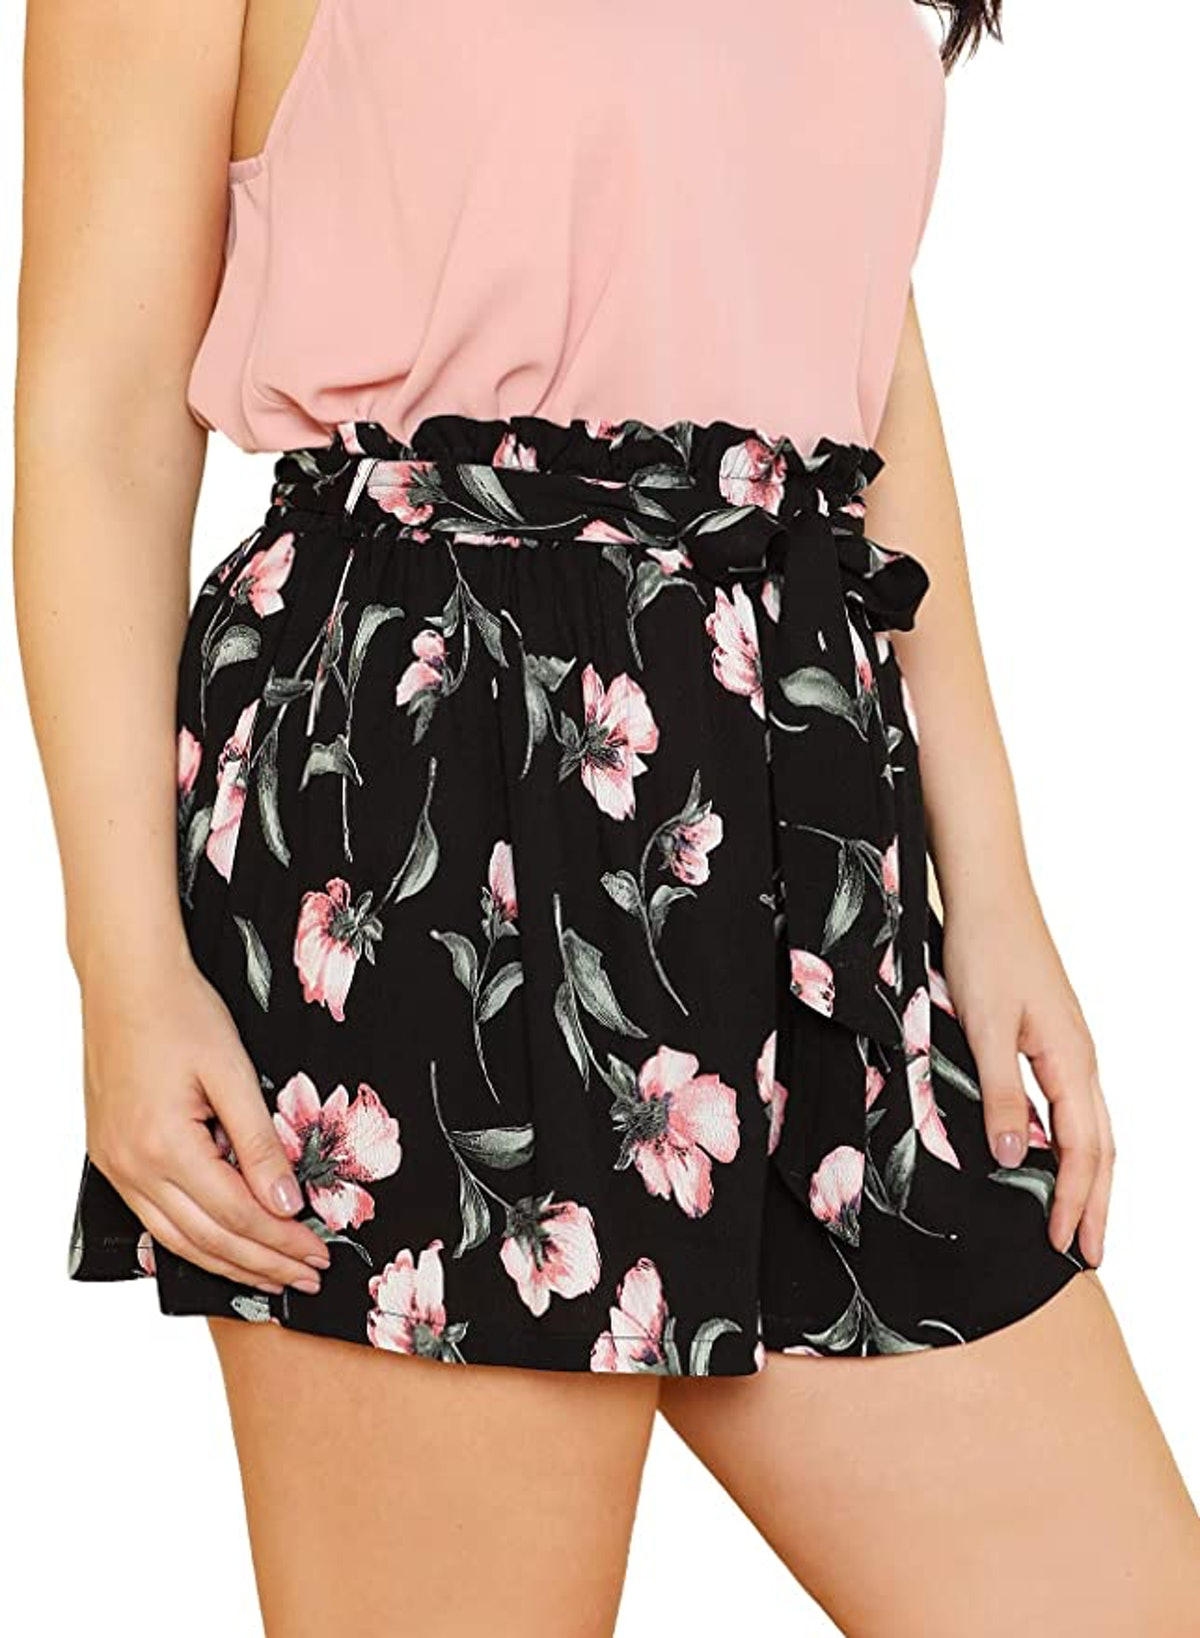 Floerns Plus Size Shorts